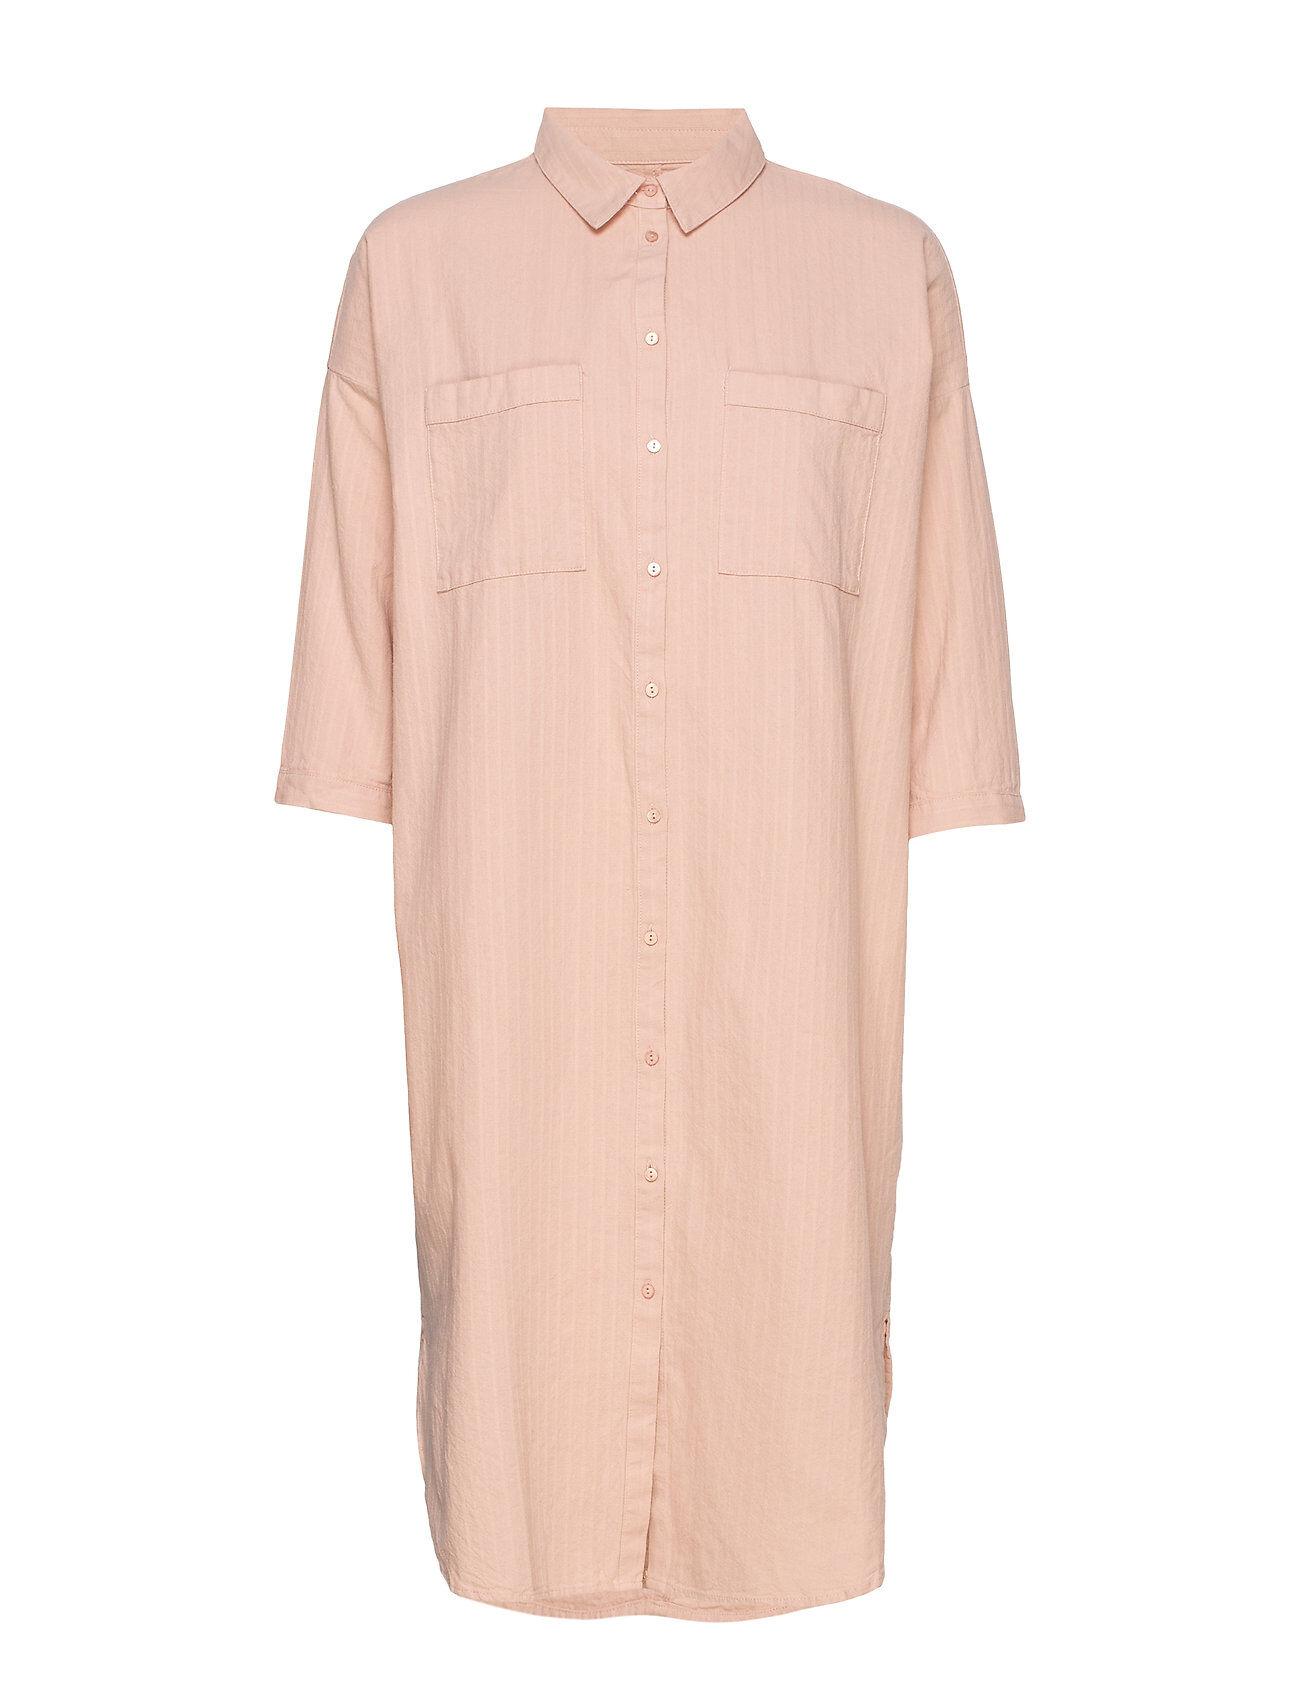 Saint Tropez Livasz Dress Polvipituinen Mekko Vaaleanpunainen Saint Tropez